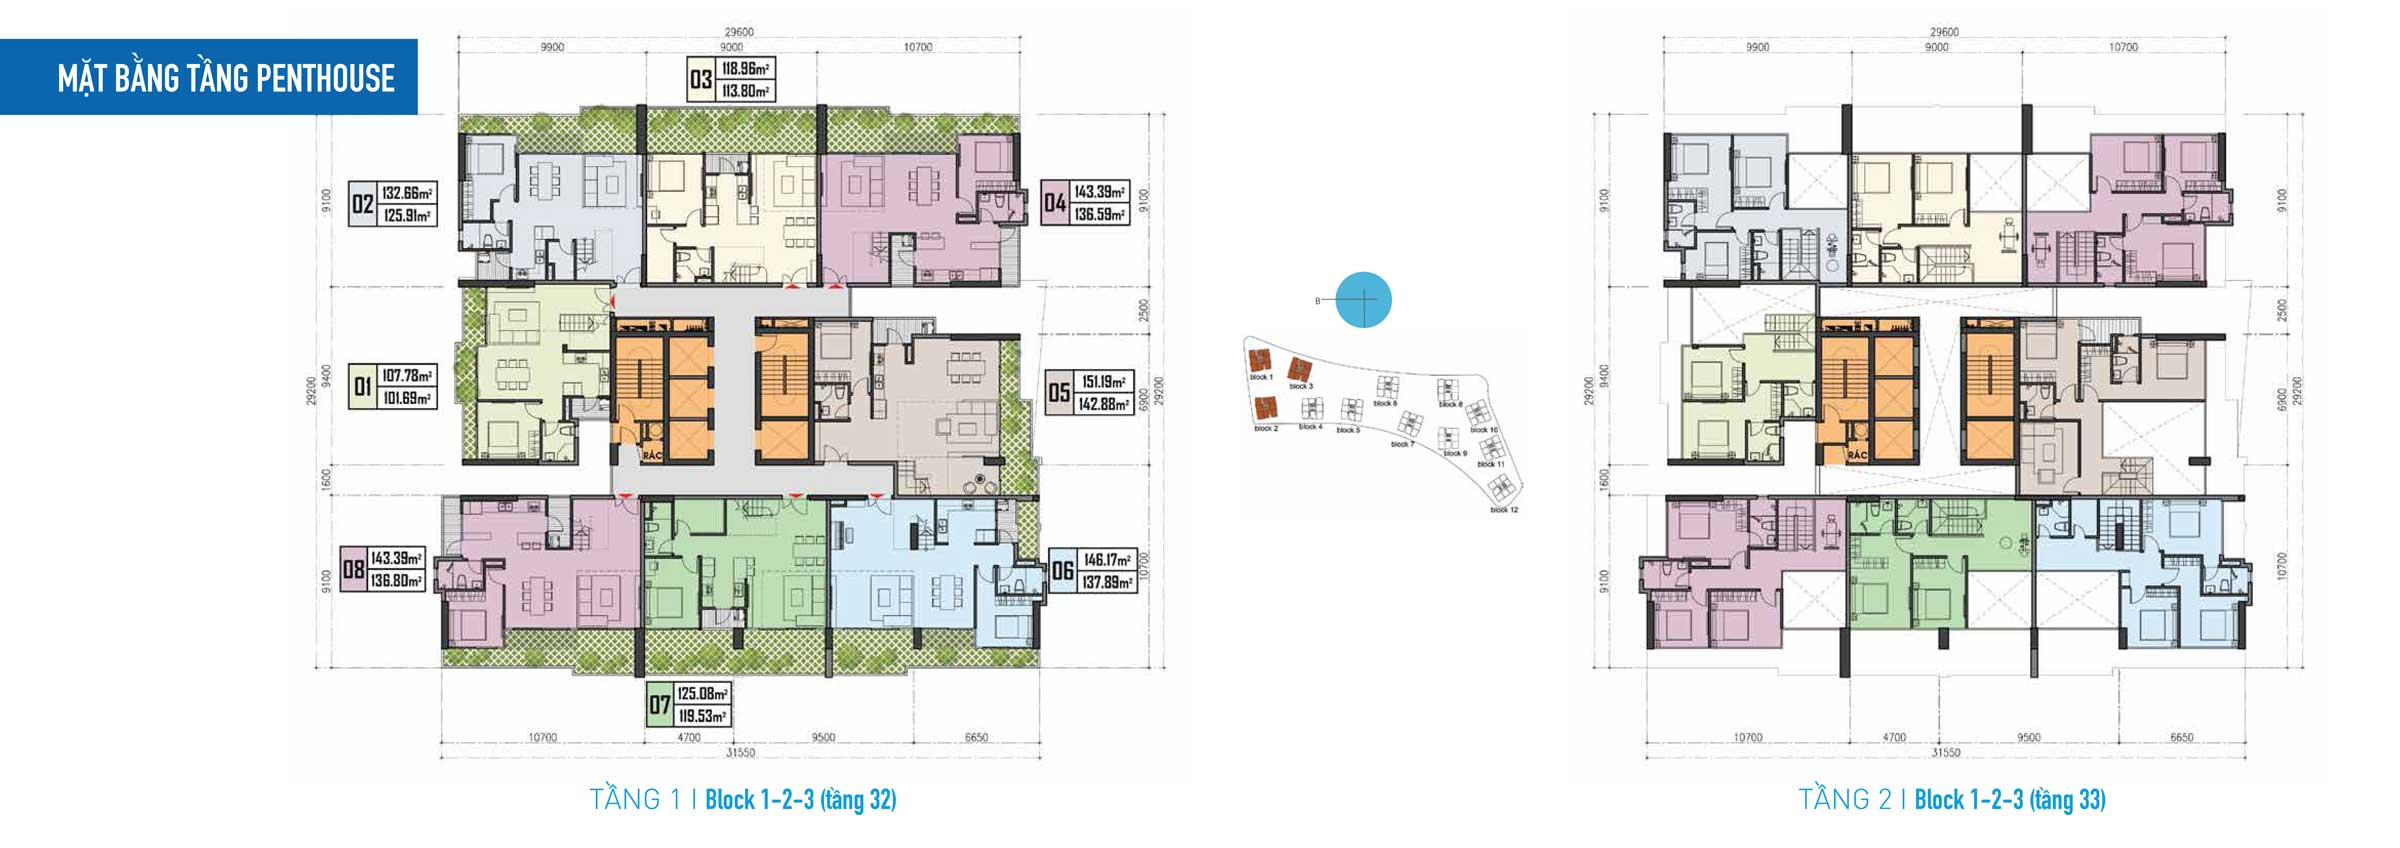 Thiết kế Căn hộ Gem Riverside - Mặt bằng tầng 32 penthouse-Block-123